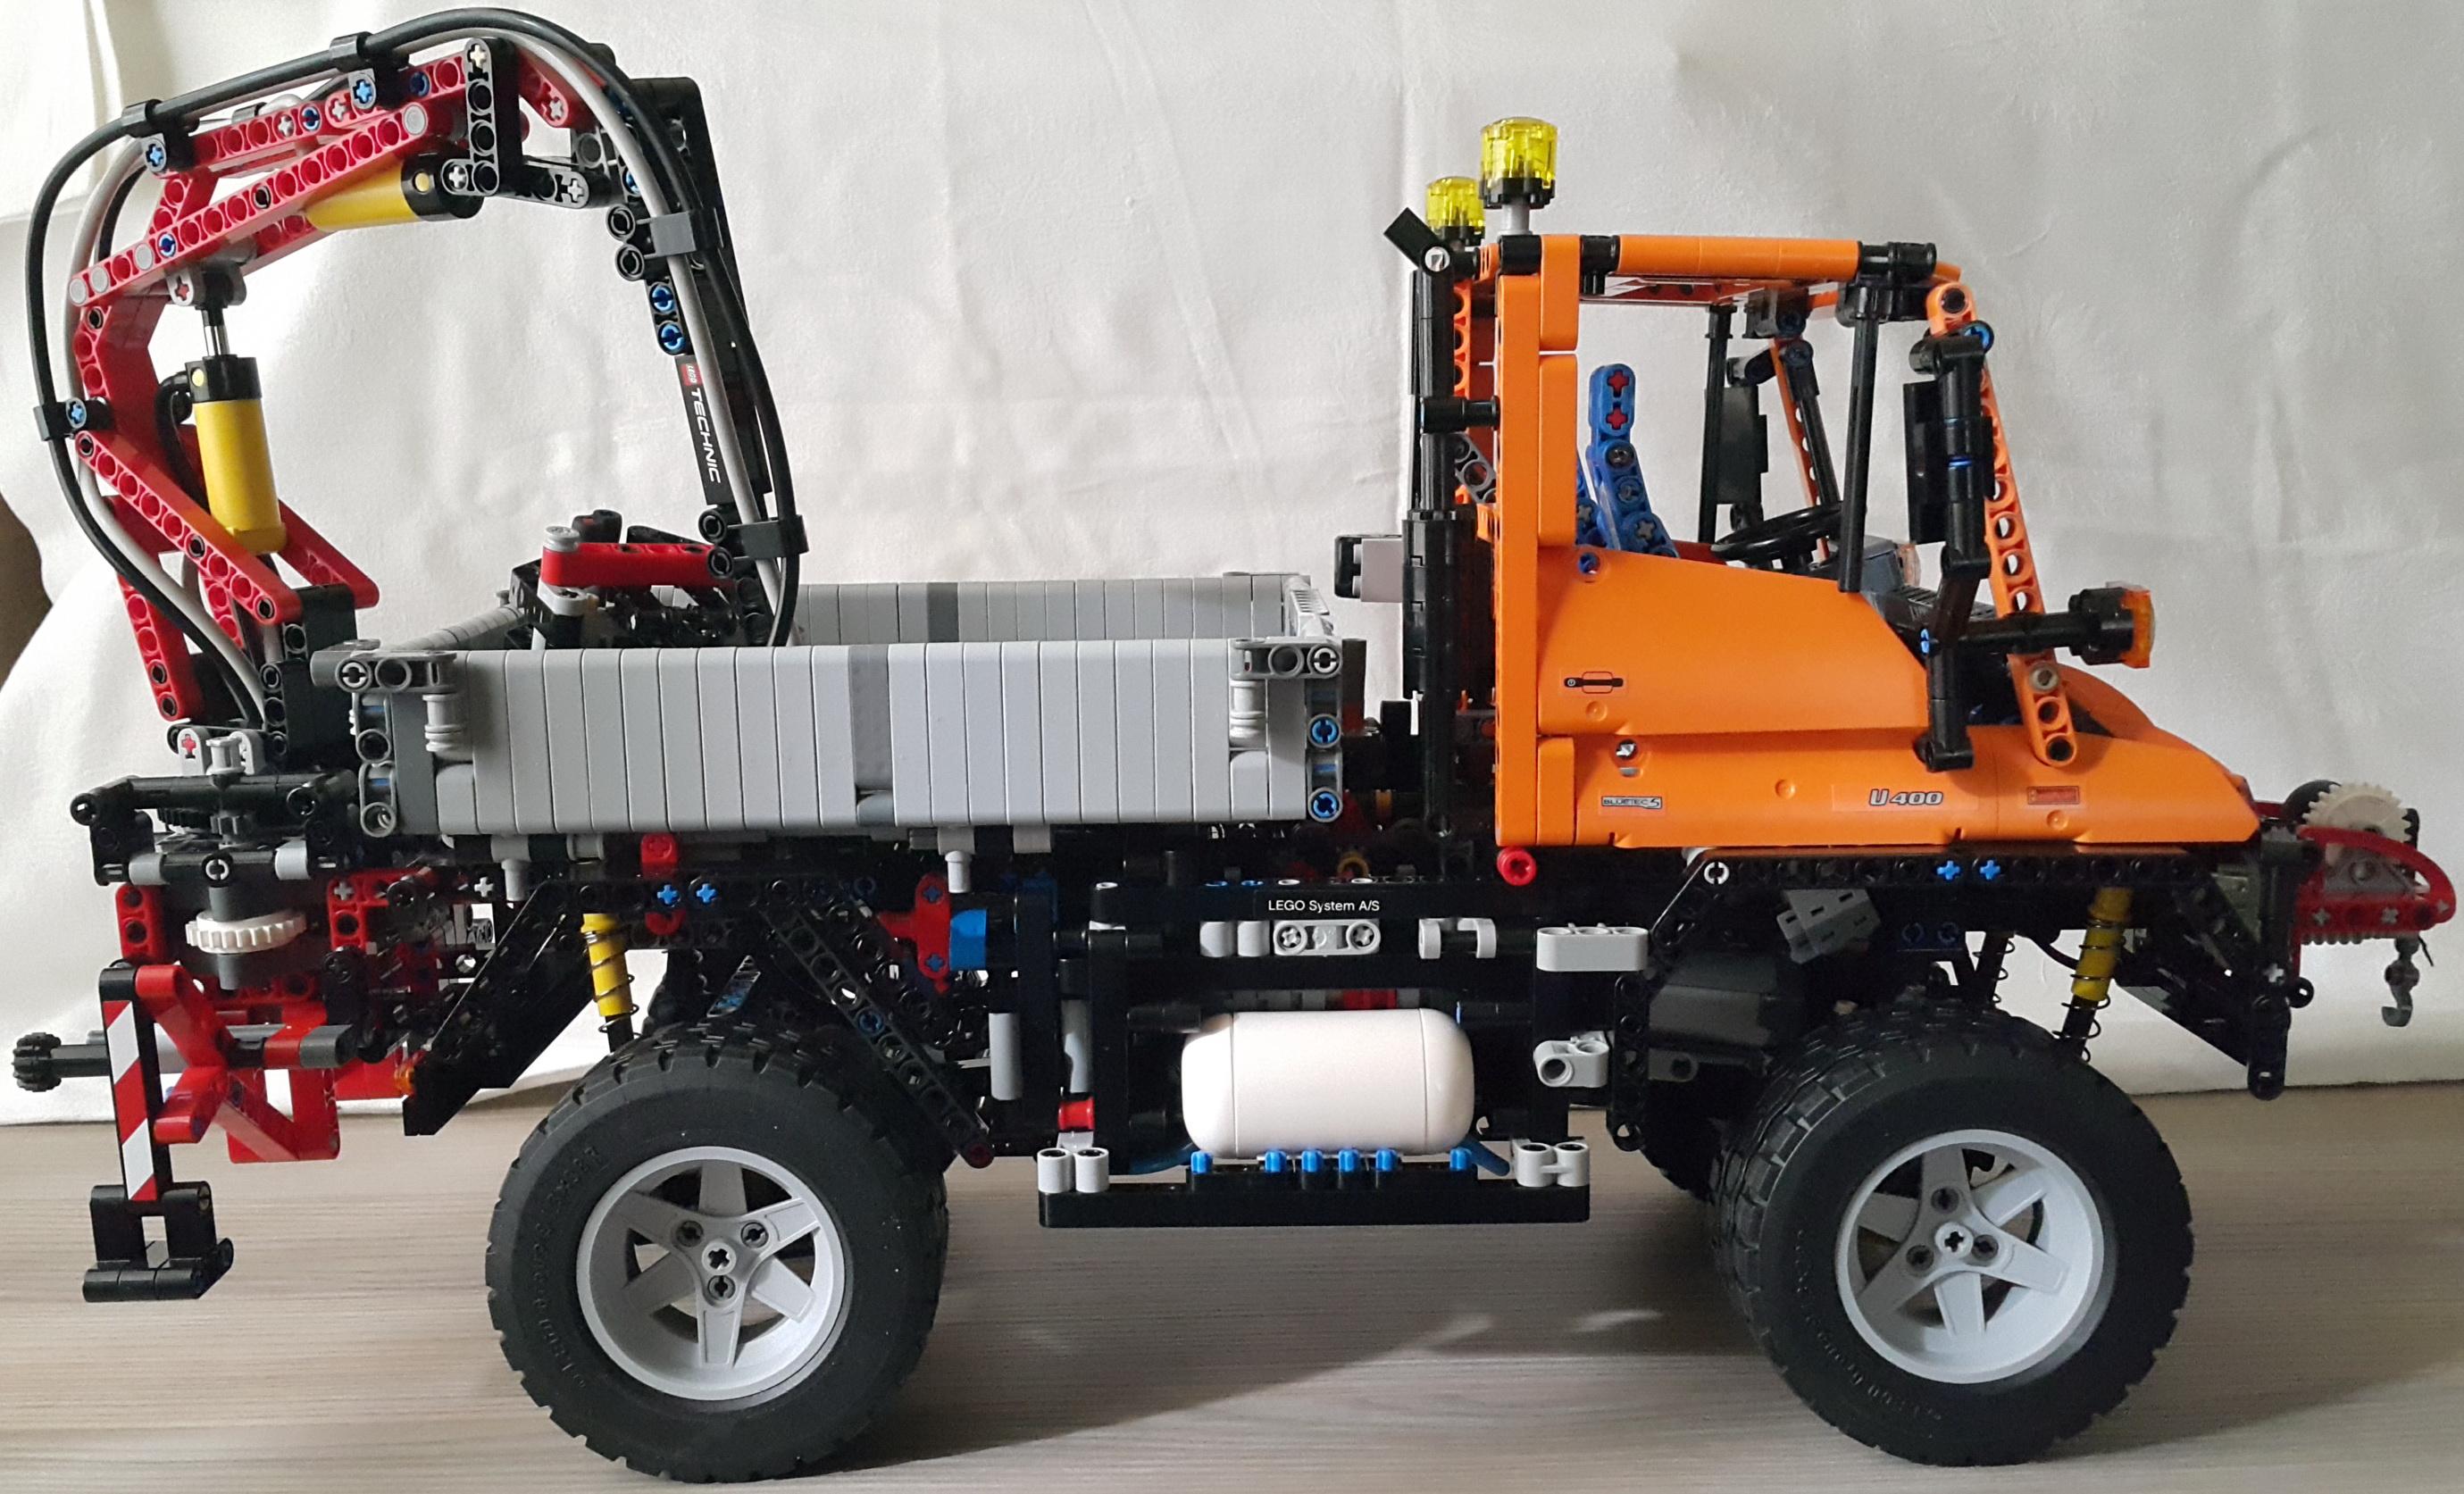 Moc 3286 8110 Unimog Rc By Jens Bricksafe